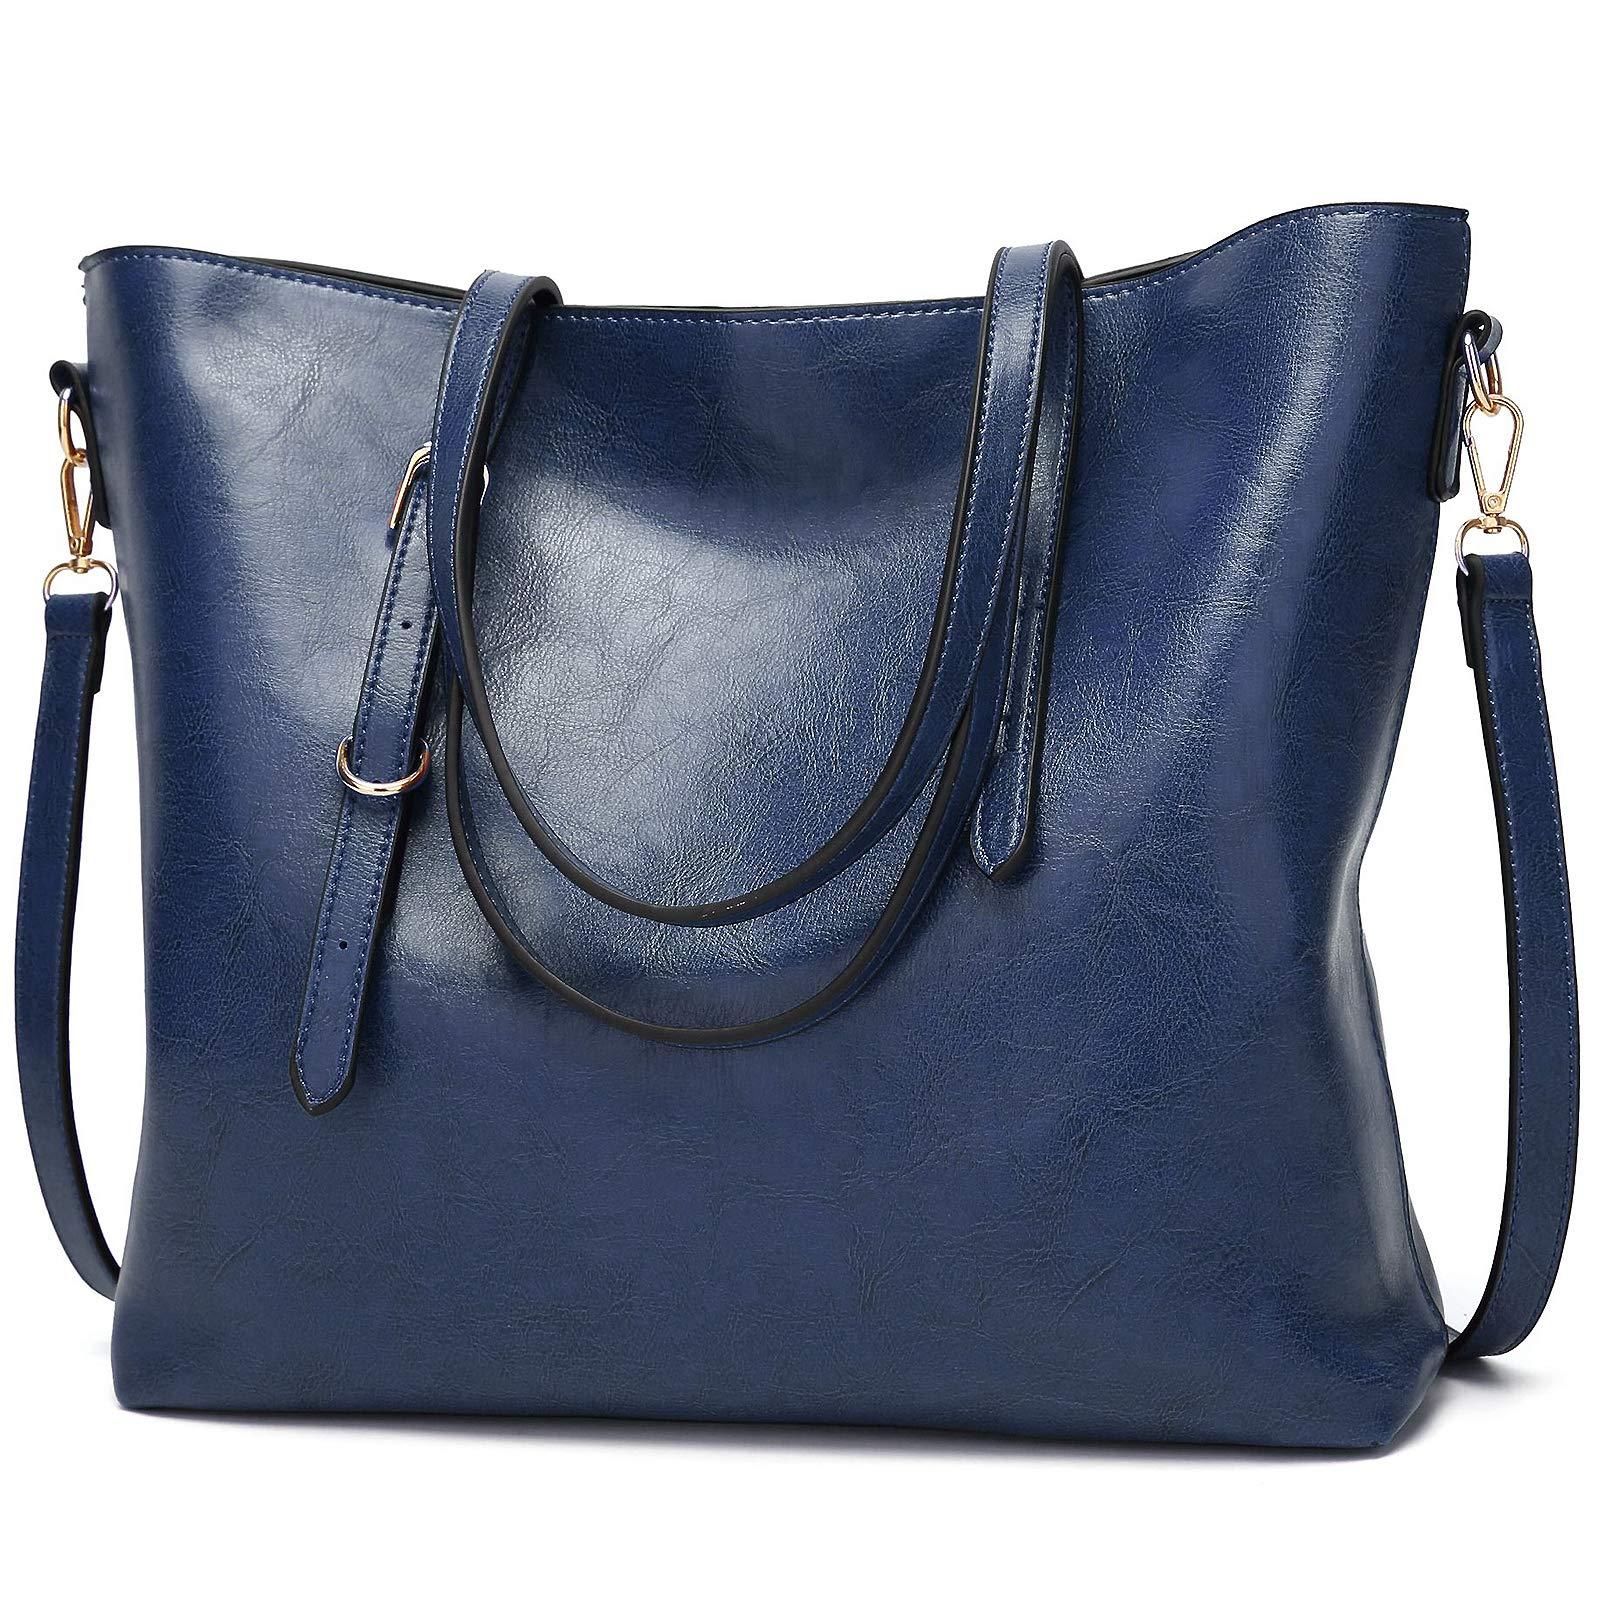 AILLOSA Purses and Handbags for Women Satchel Shoulder Tote Bags